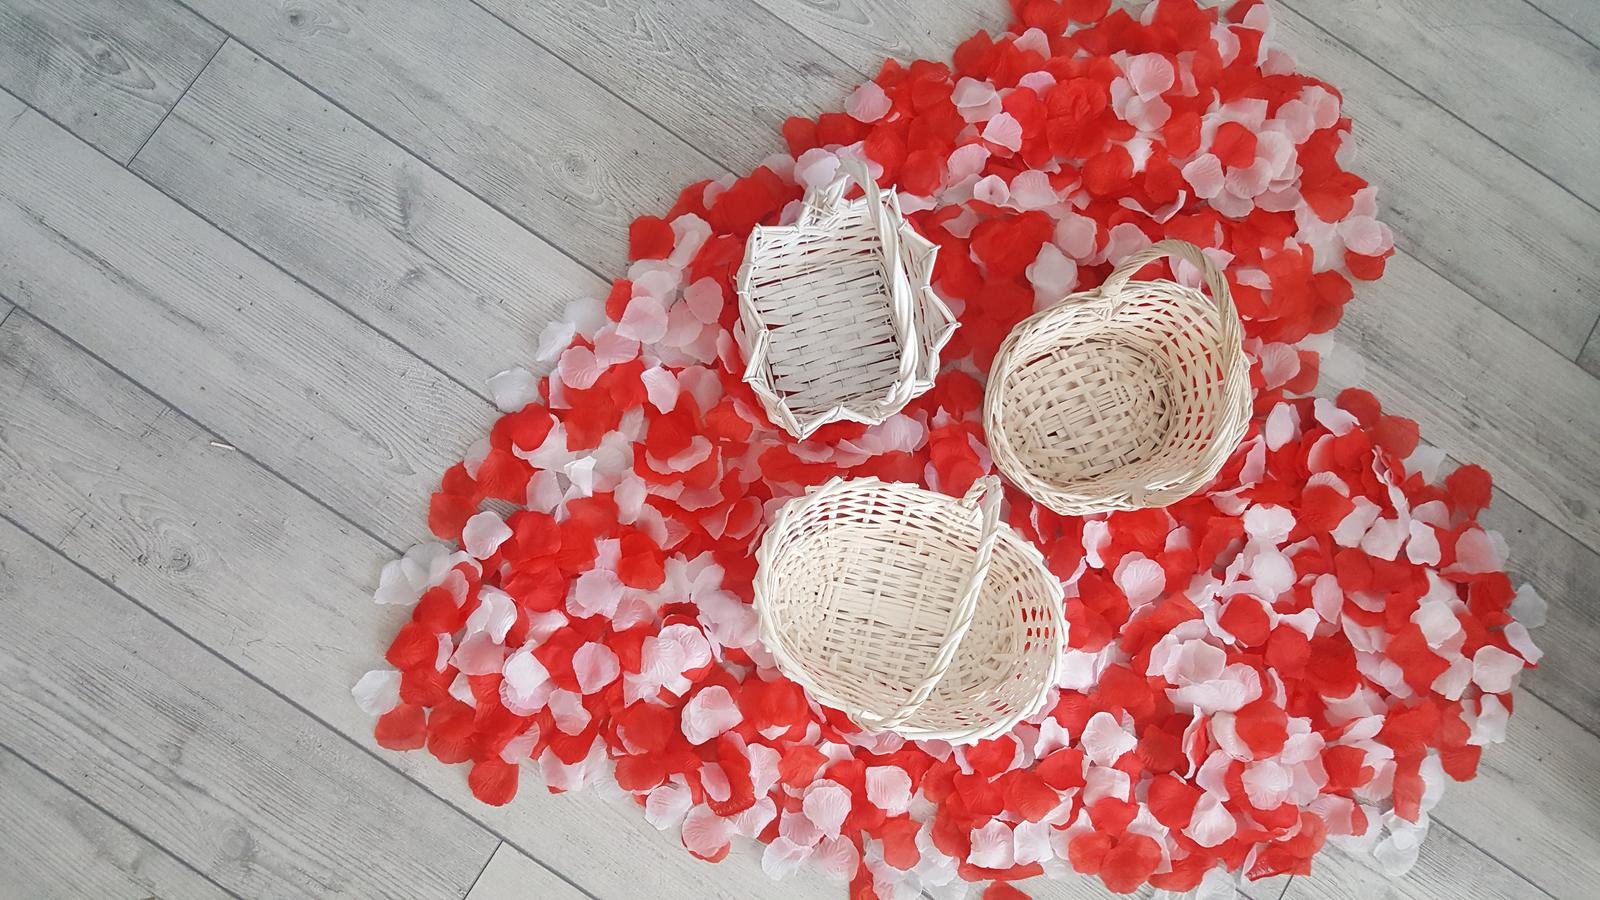 Košíky a bielo-červené lupene ruží - Obrázok č. 1